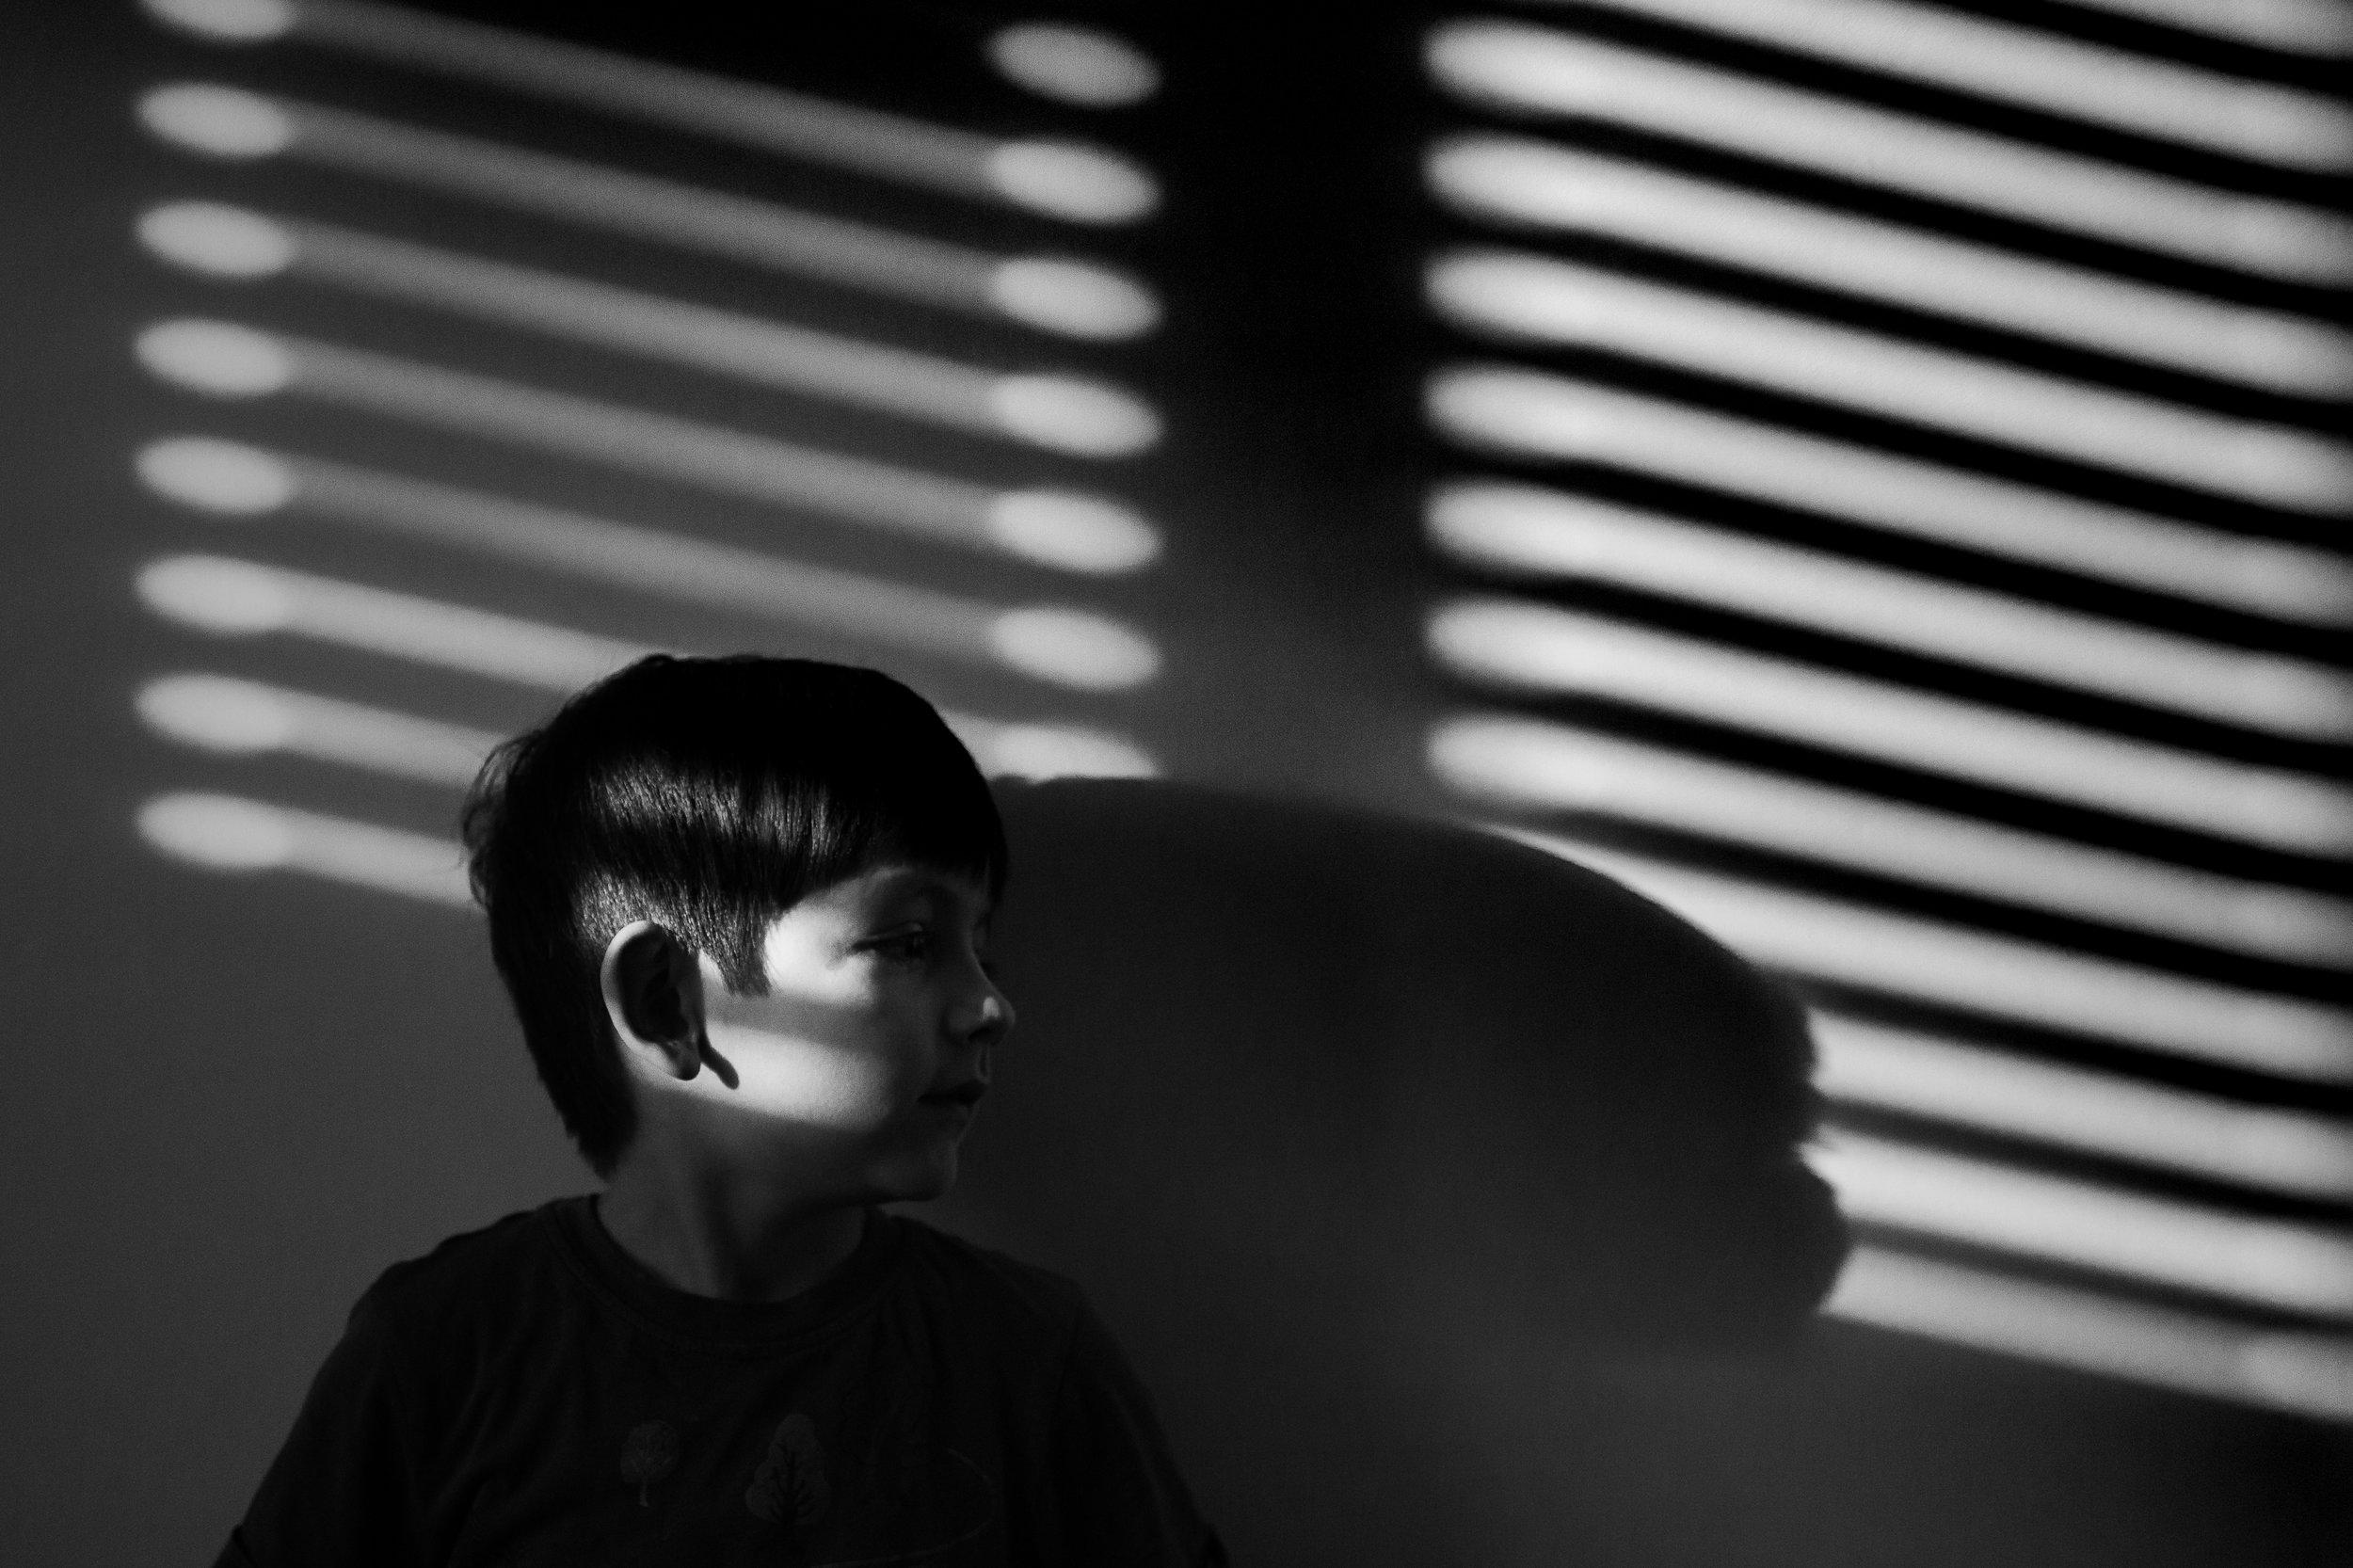 Shutters & Shadows Winter Home 03.jpg